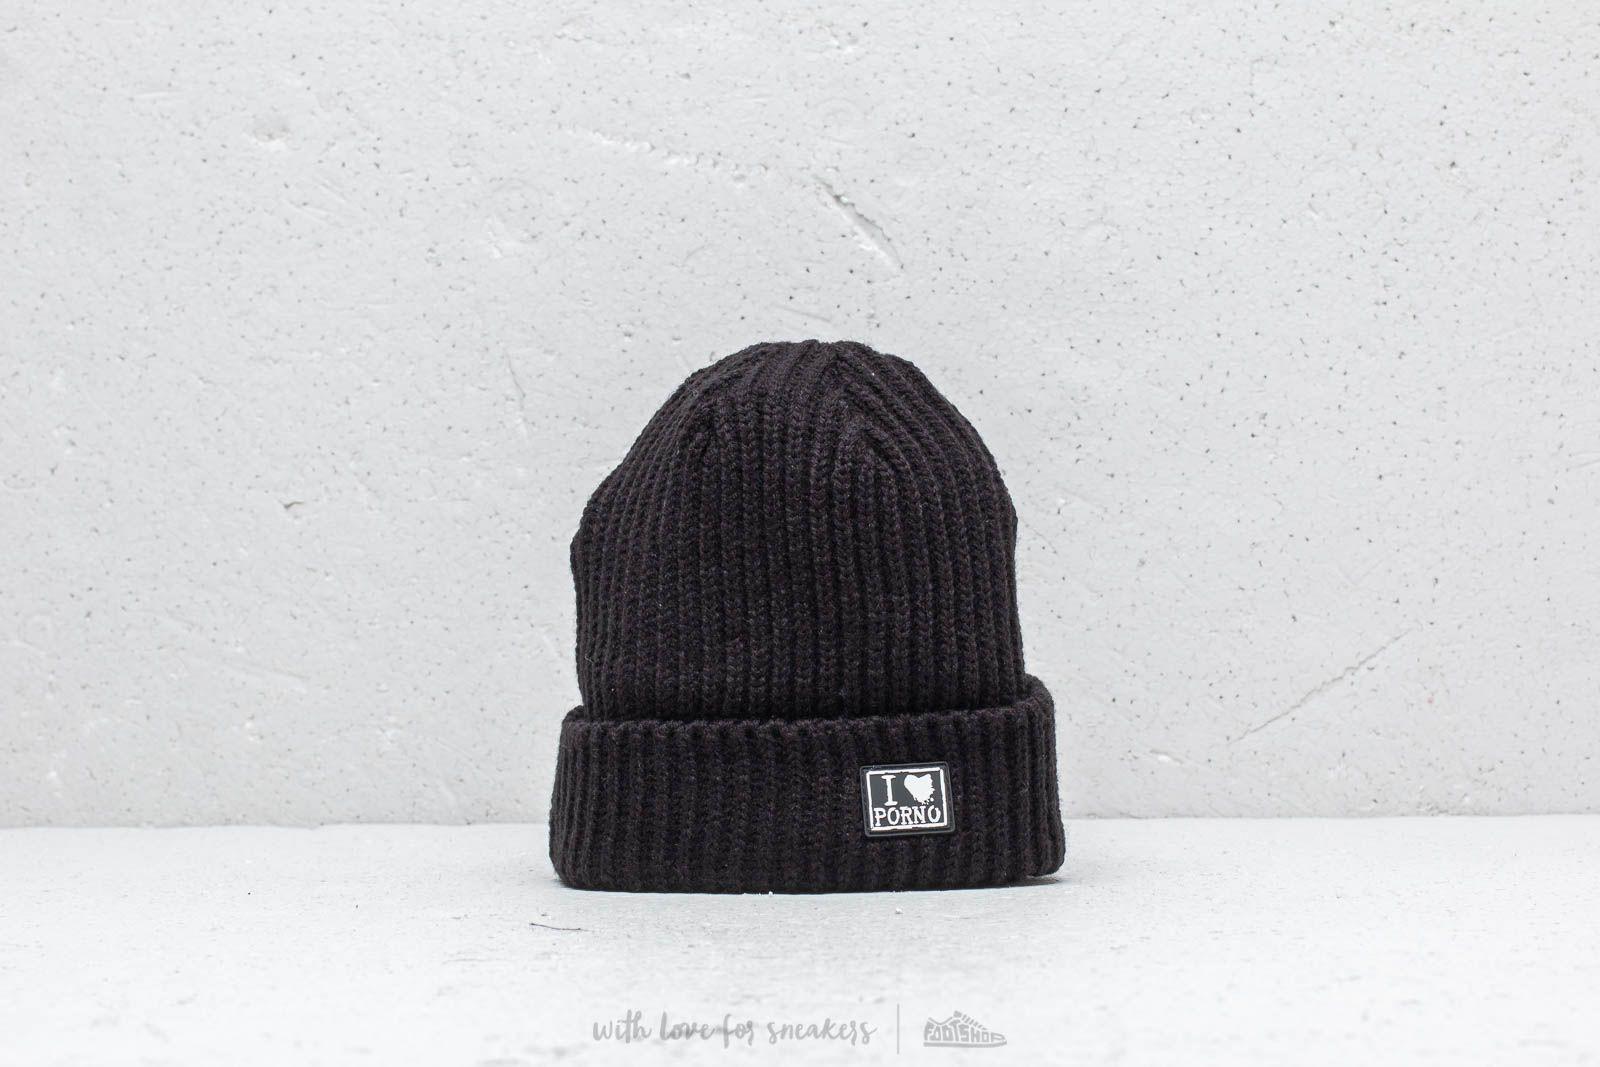 LIFE IS PORNO TAXI Driver Beanie Ultra Short Black za skvělou cenu 678 Kč koupíte na Footshop.cz